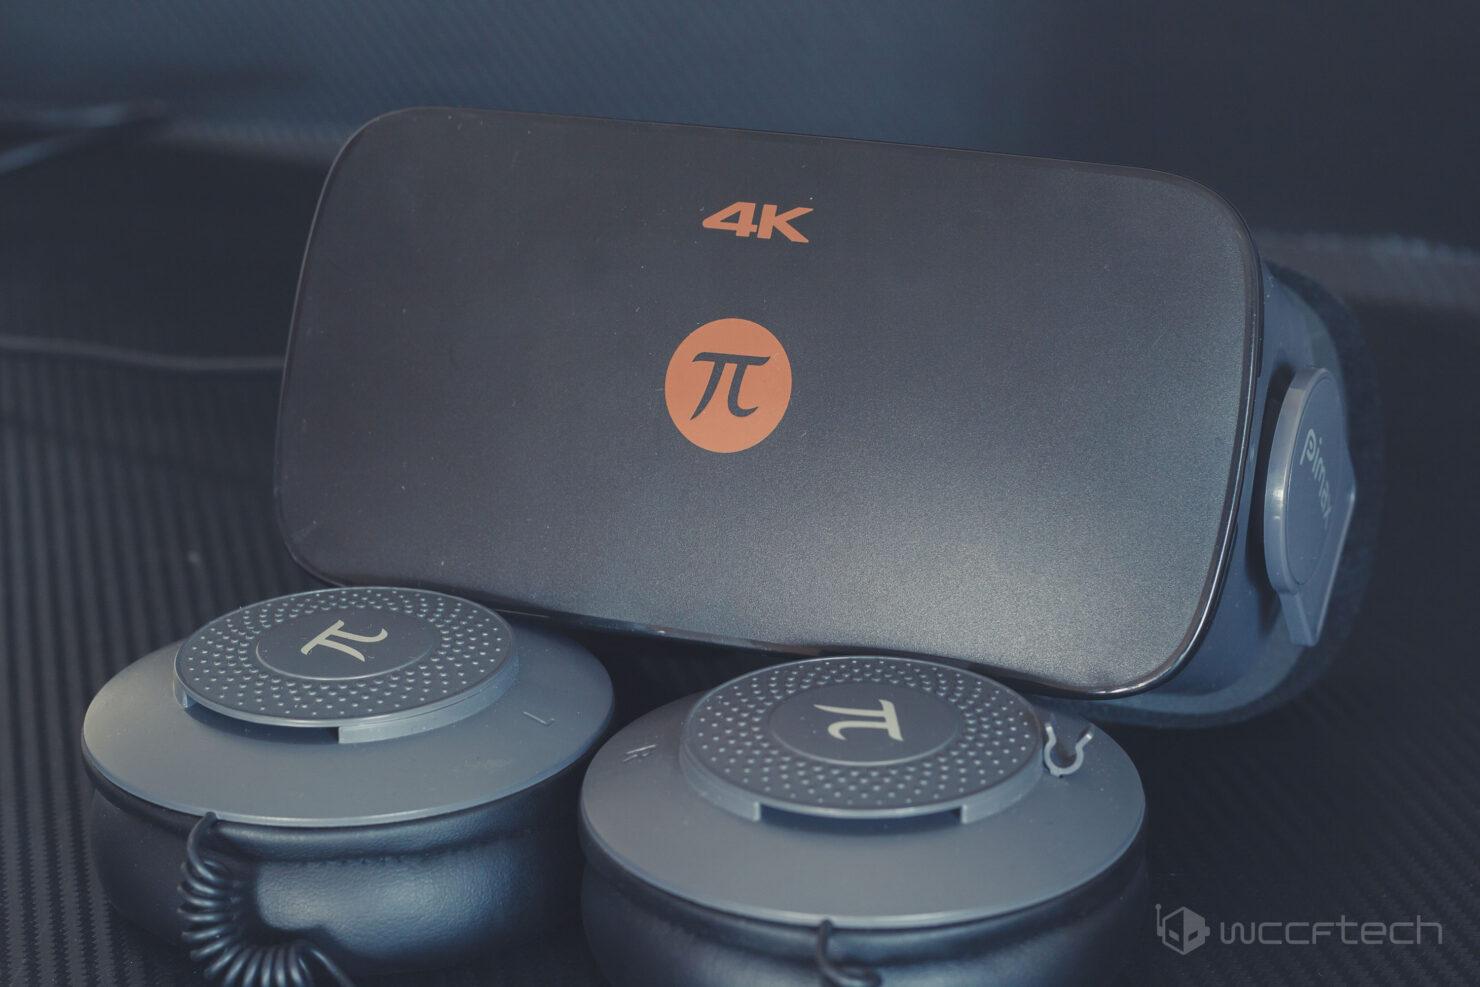 PIMAX 4K VR headset deals